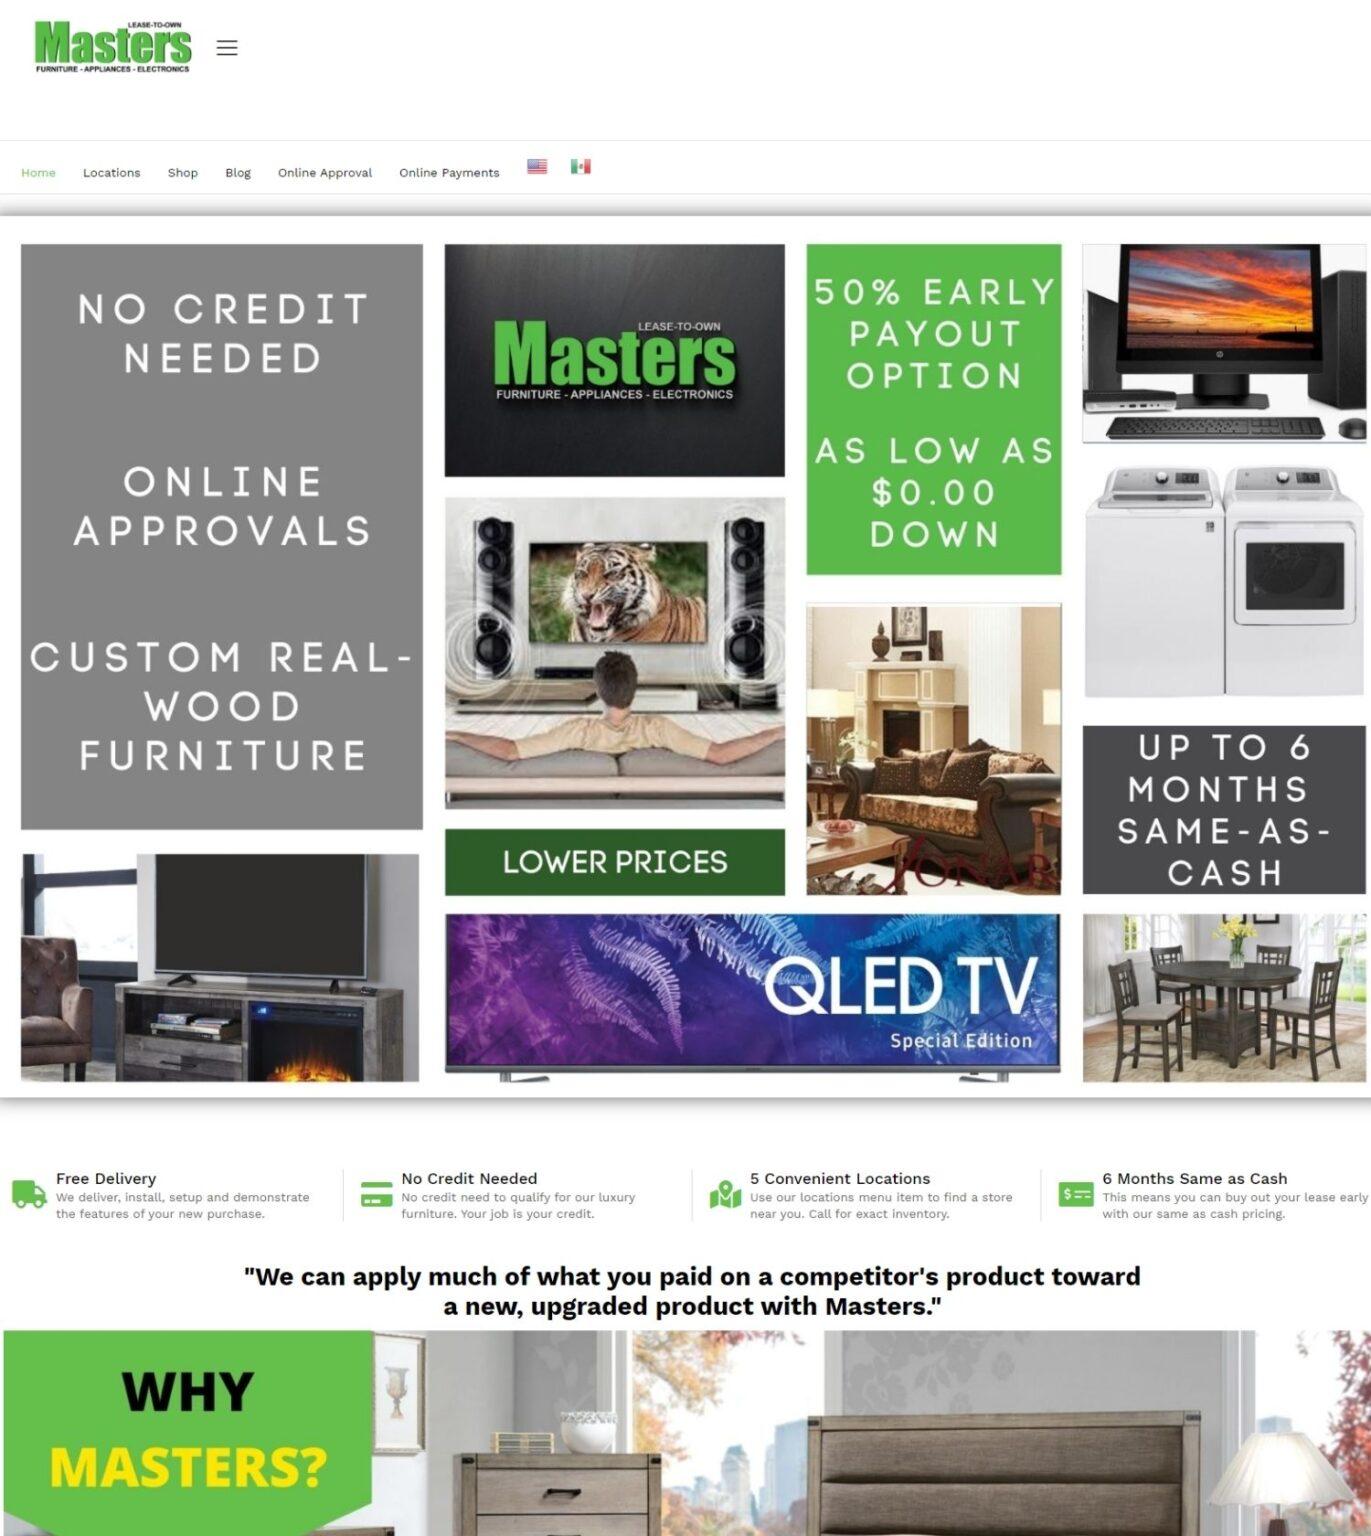 MastersLease.com